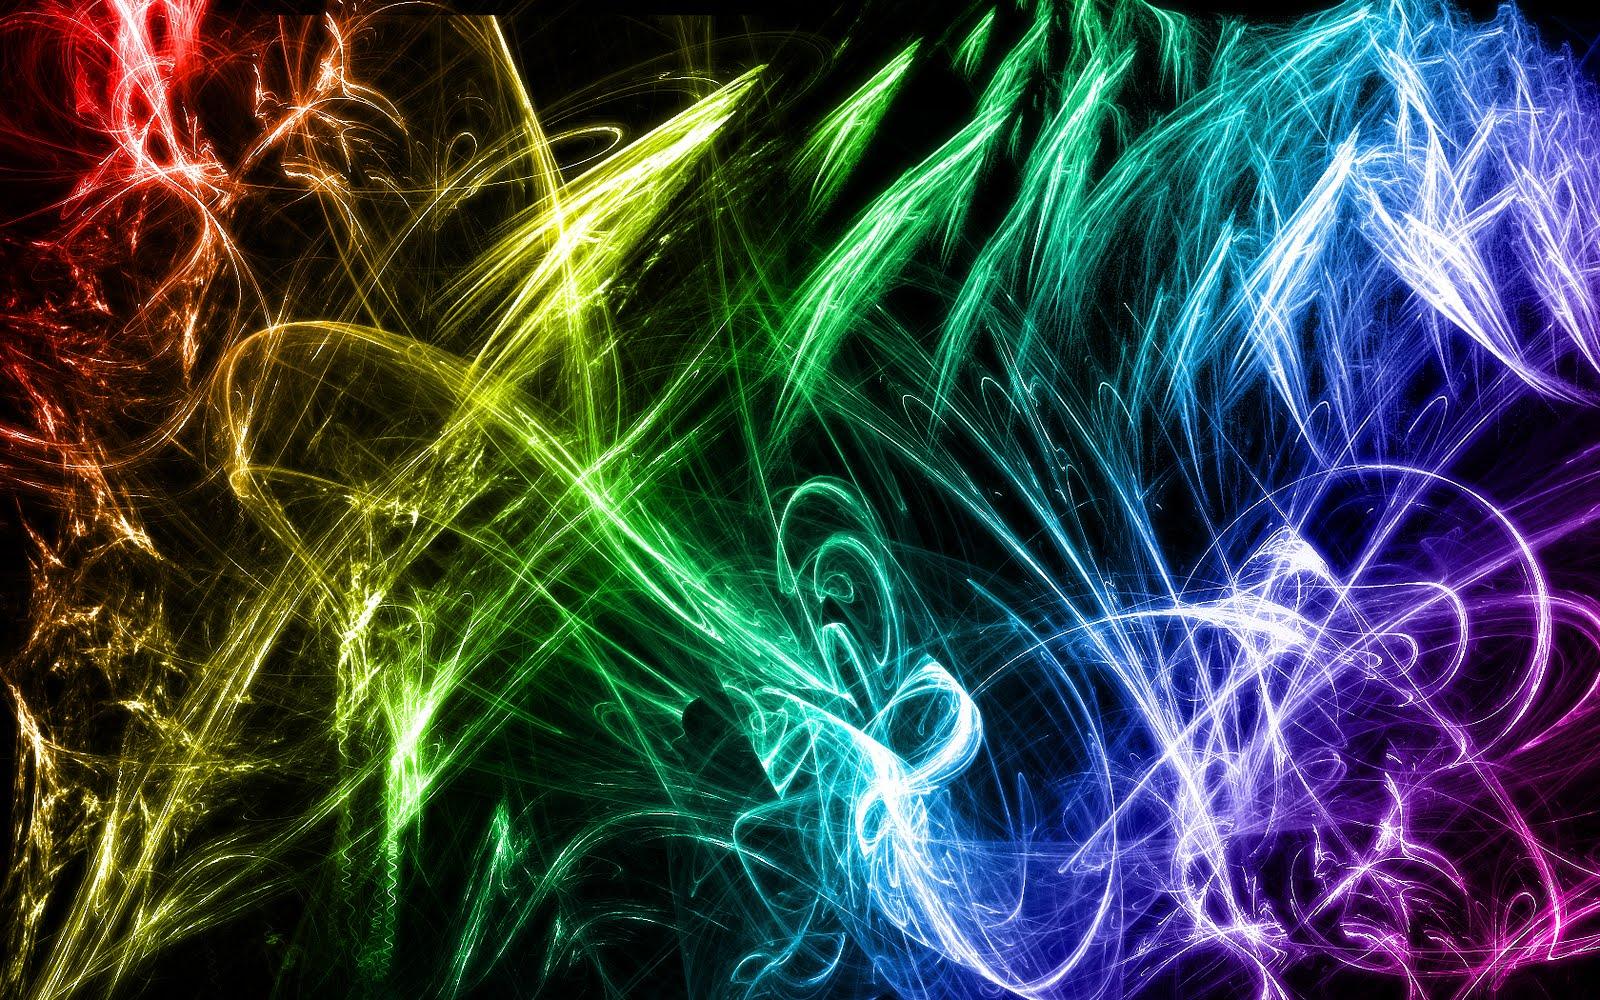 Imagini desktop - imagini si poze desktop HD